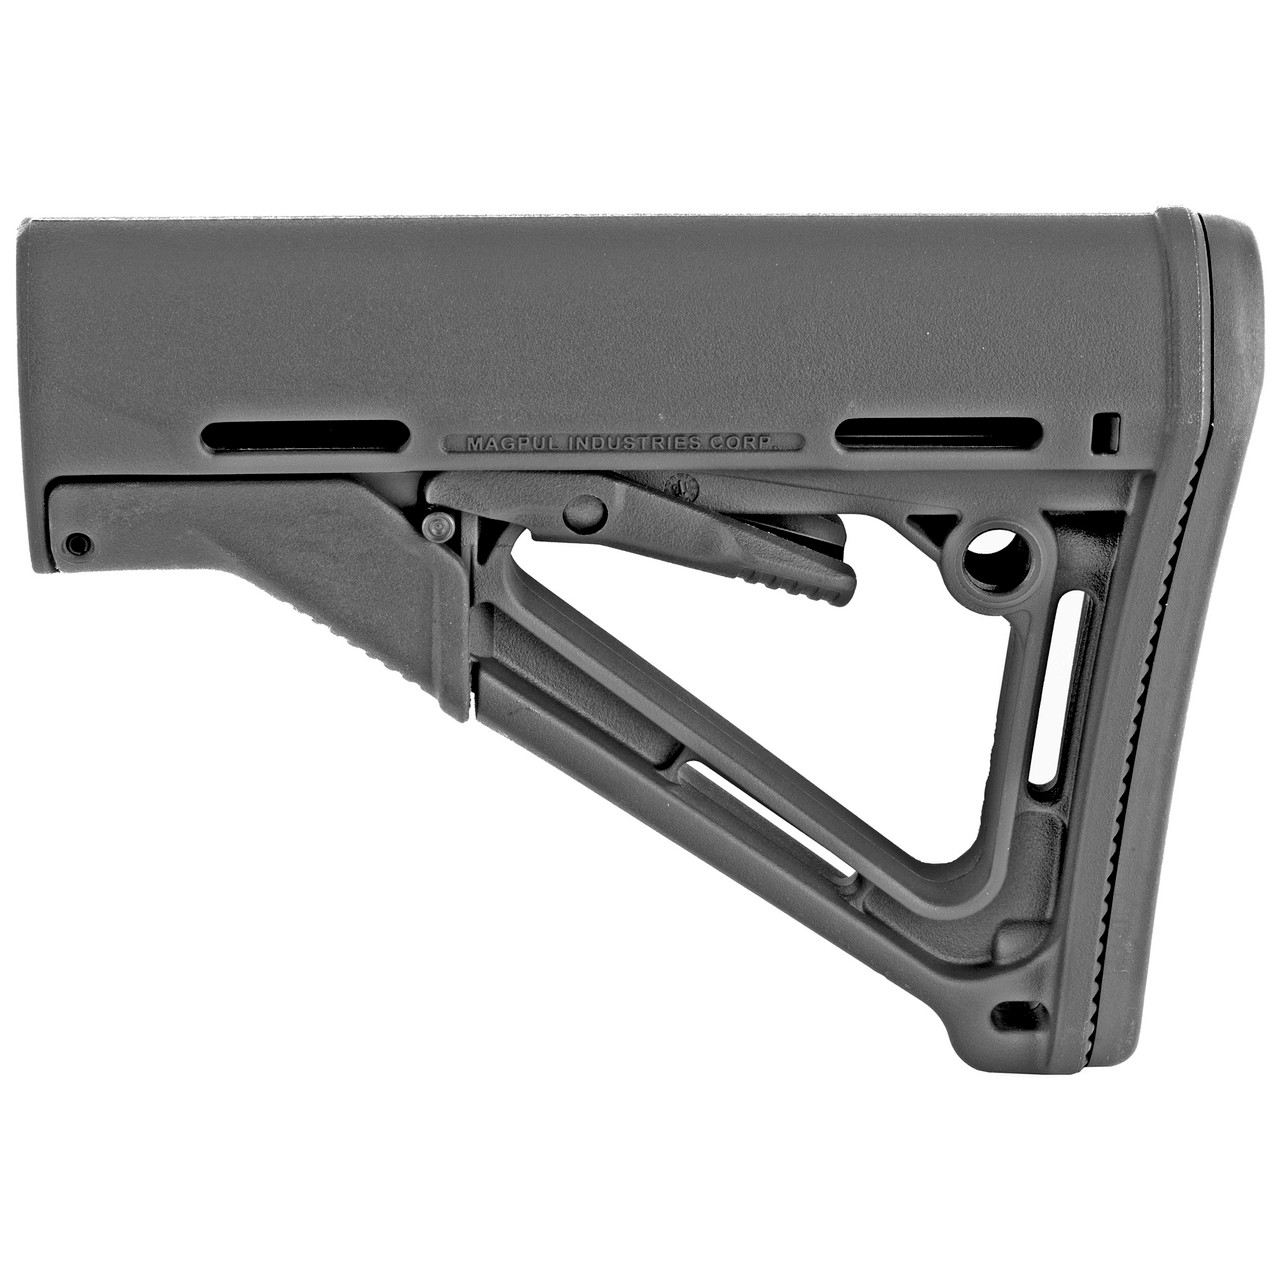 Magpul CTR Stock, AR-15, Adjustable, Black (MAG310BLK)